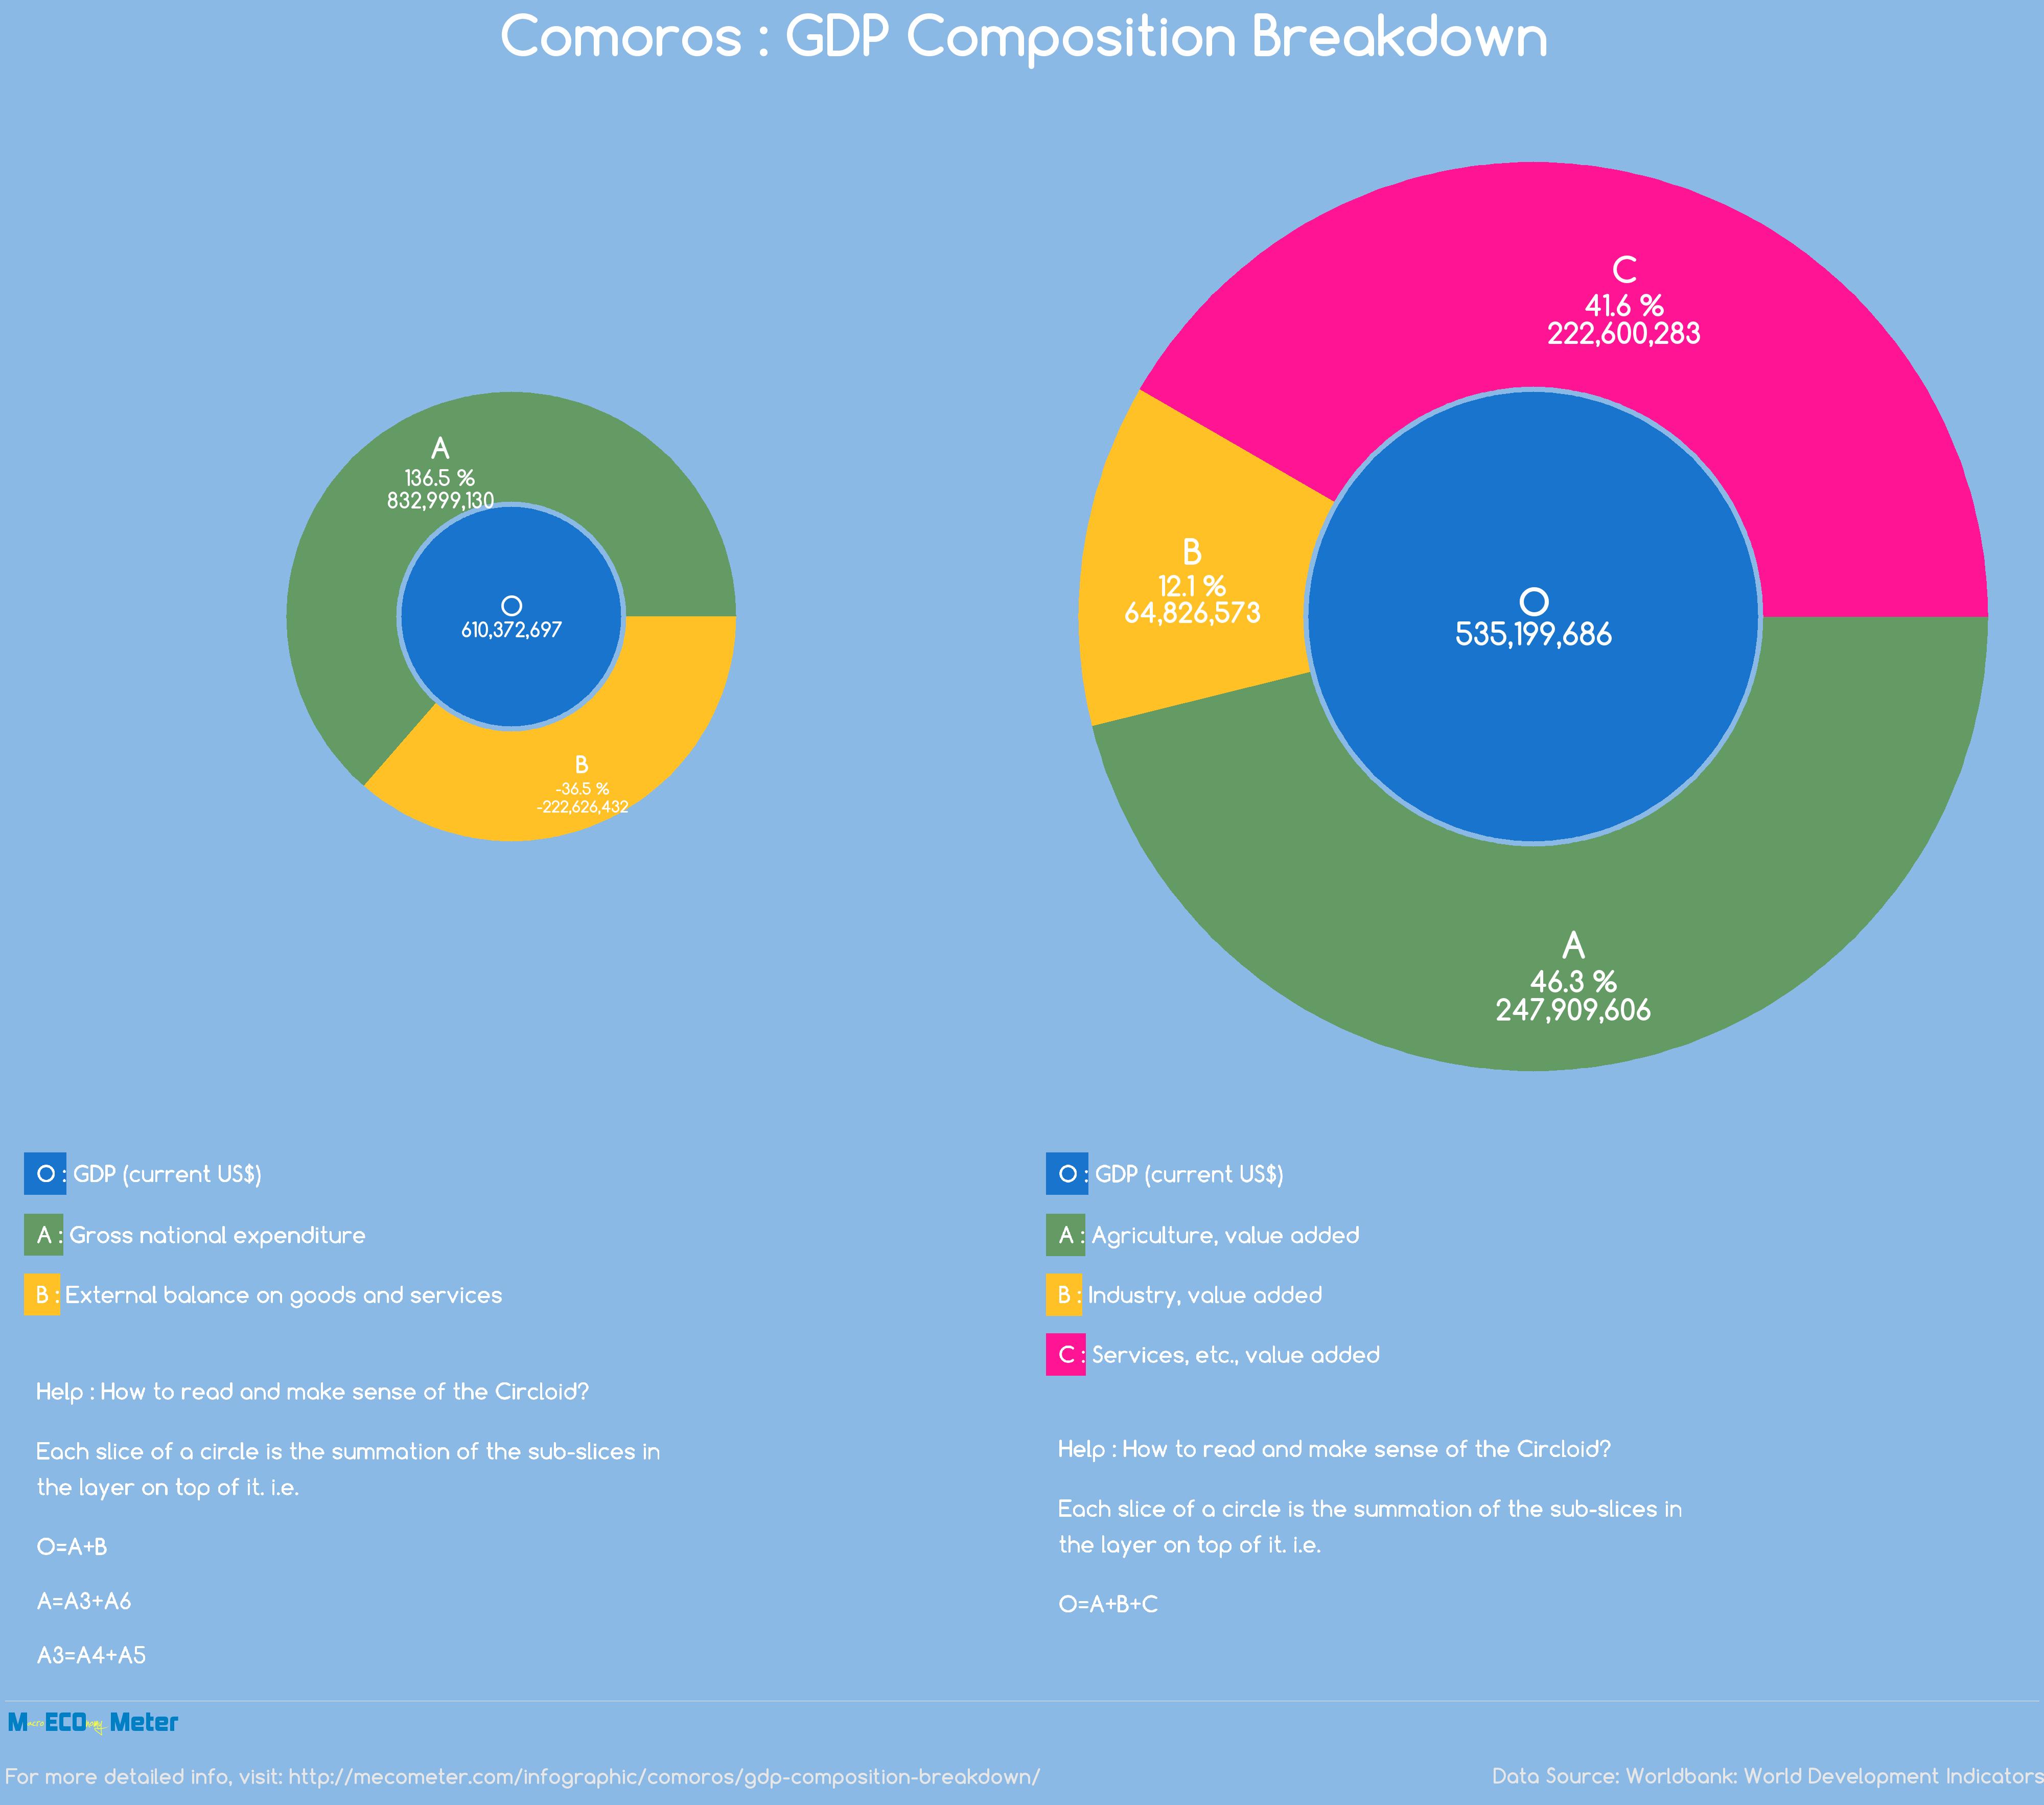 Comoros : GDP Composition Breakdown